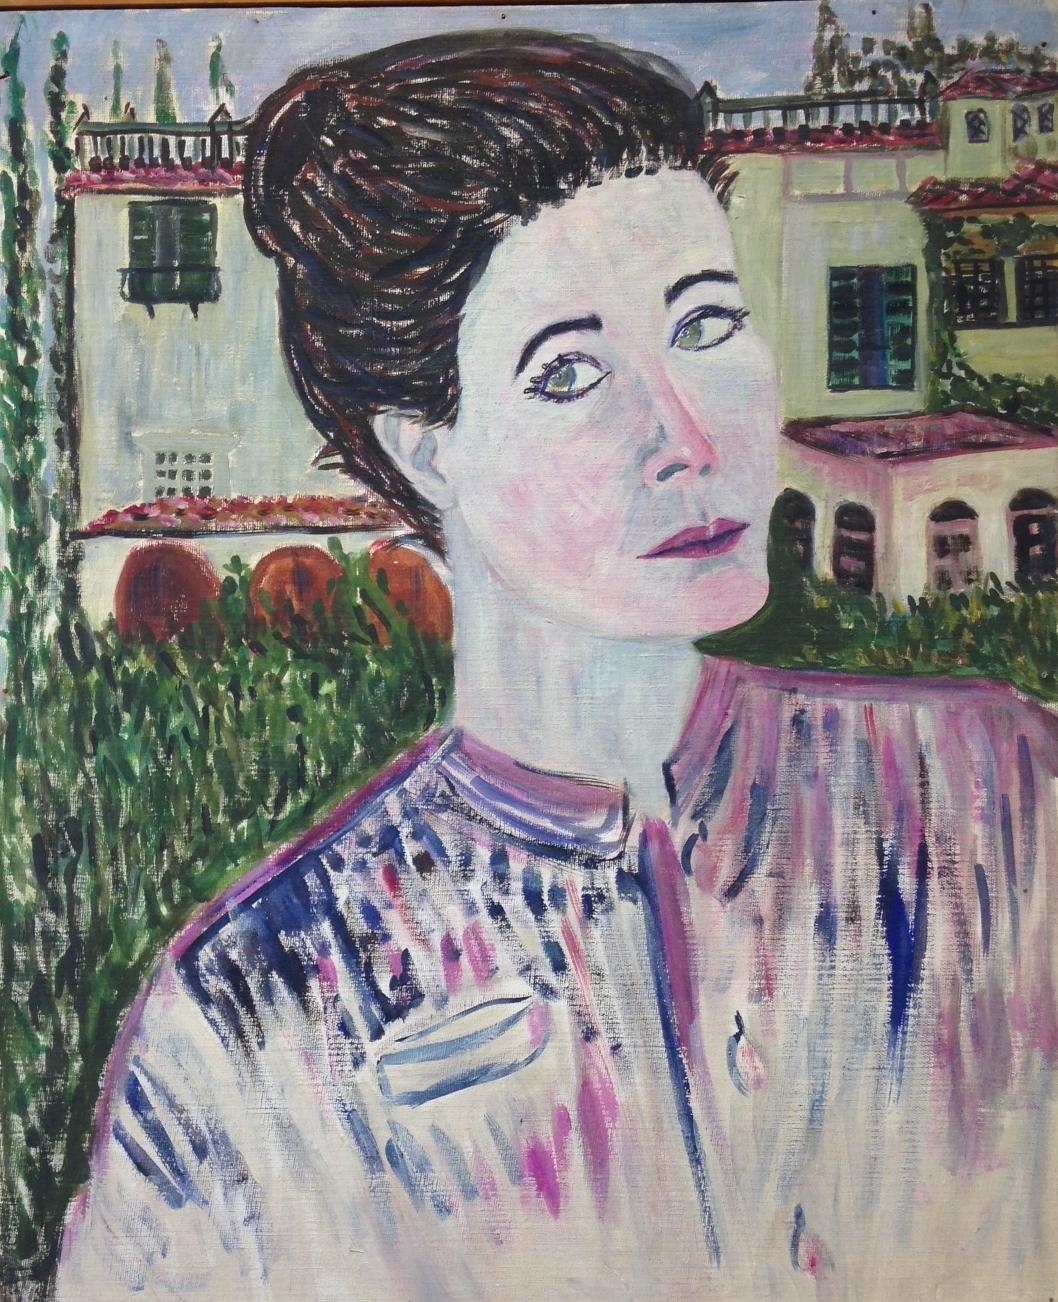 Margaret Manship